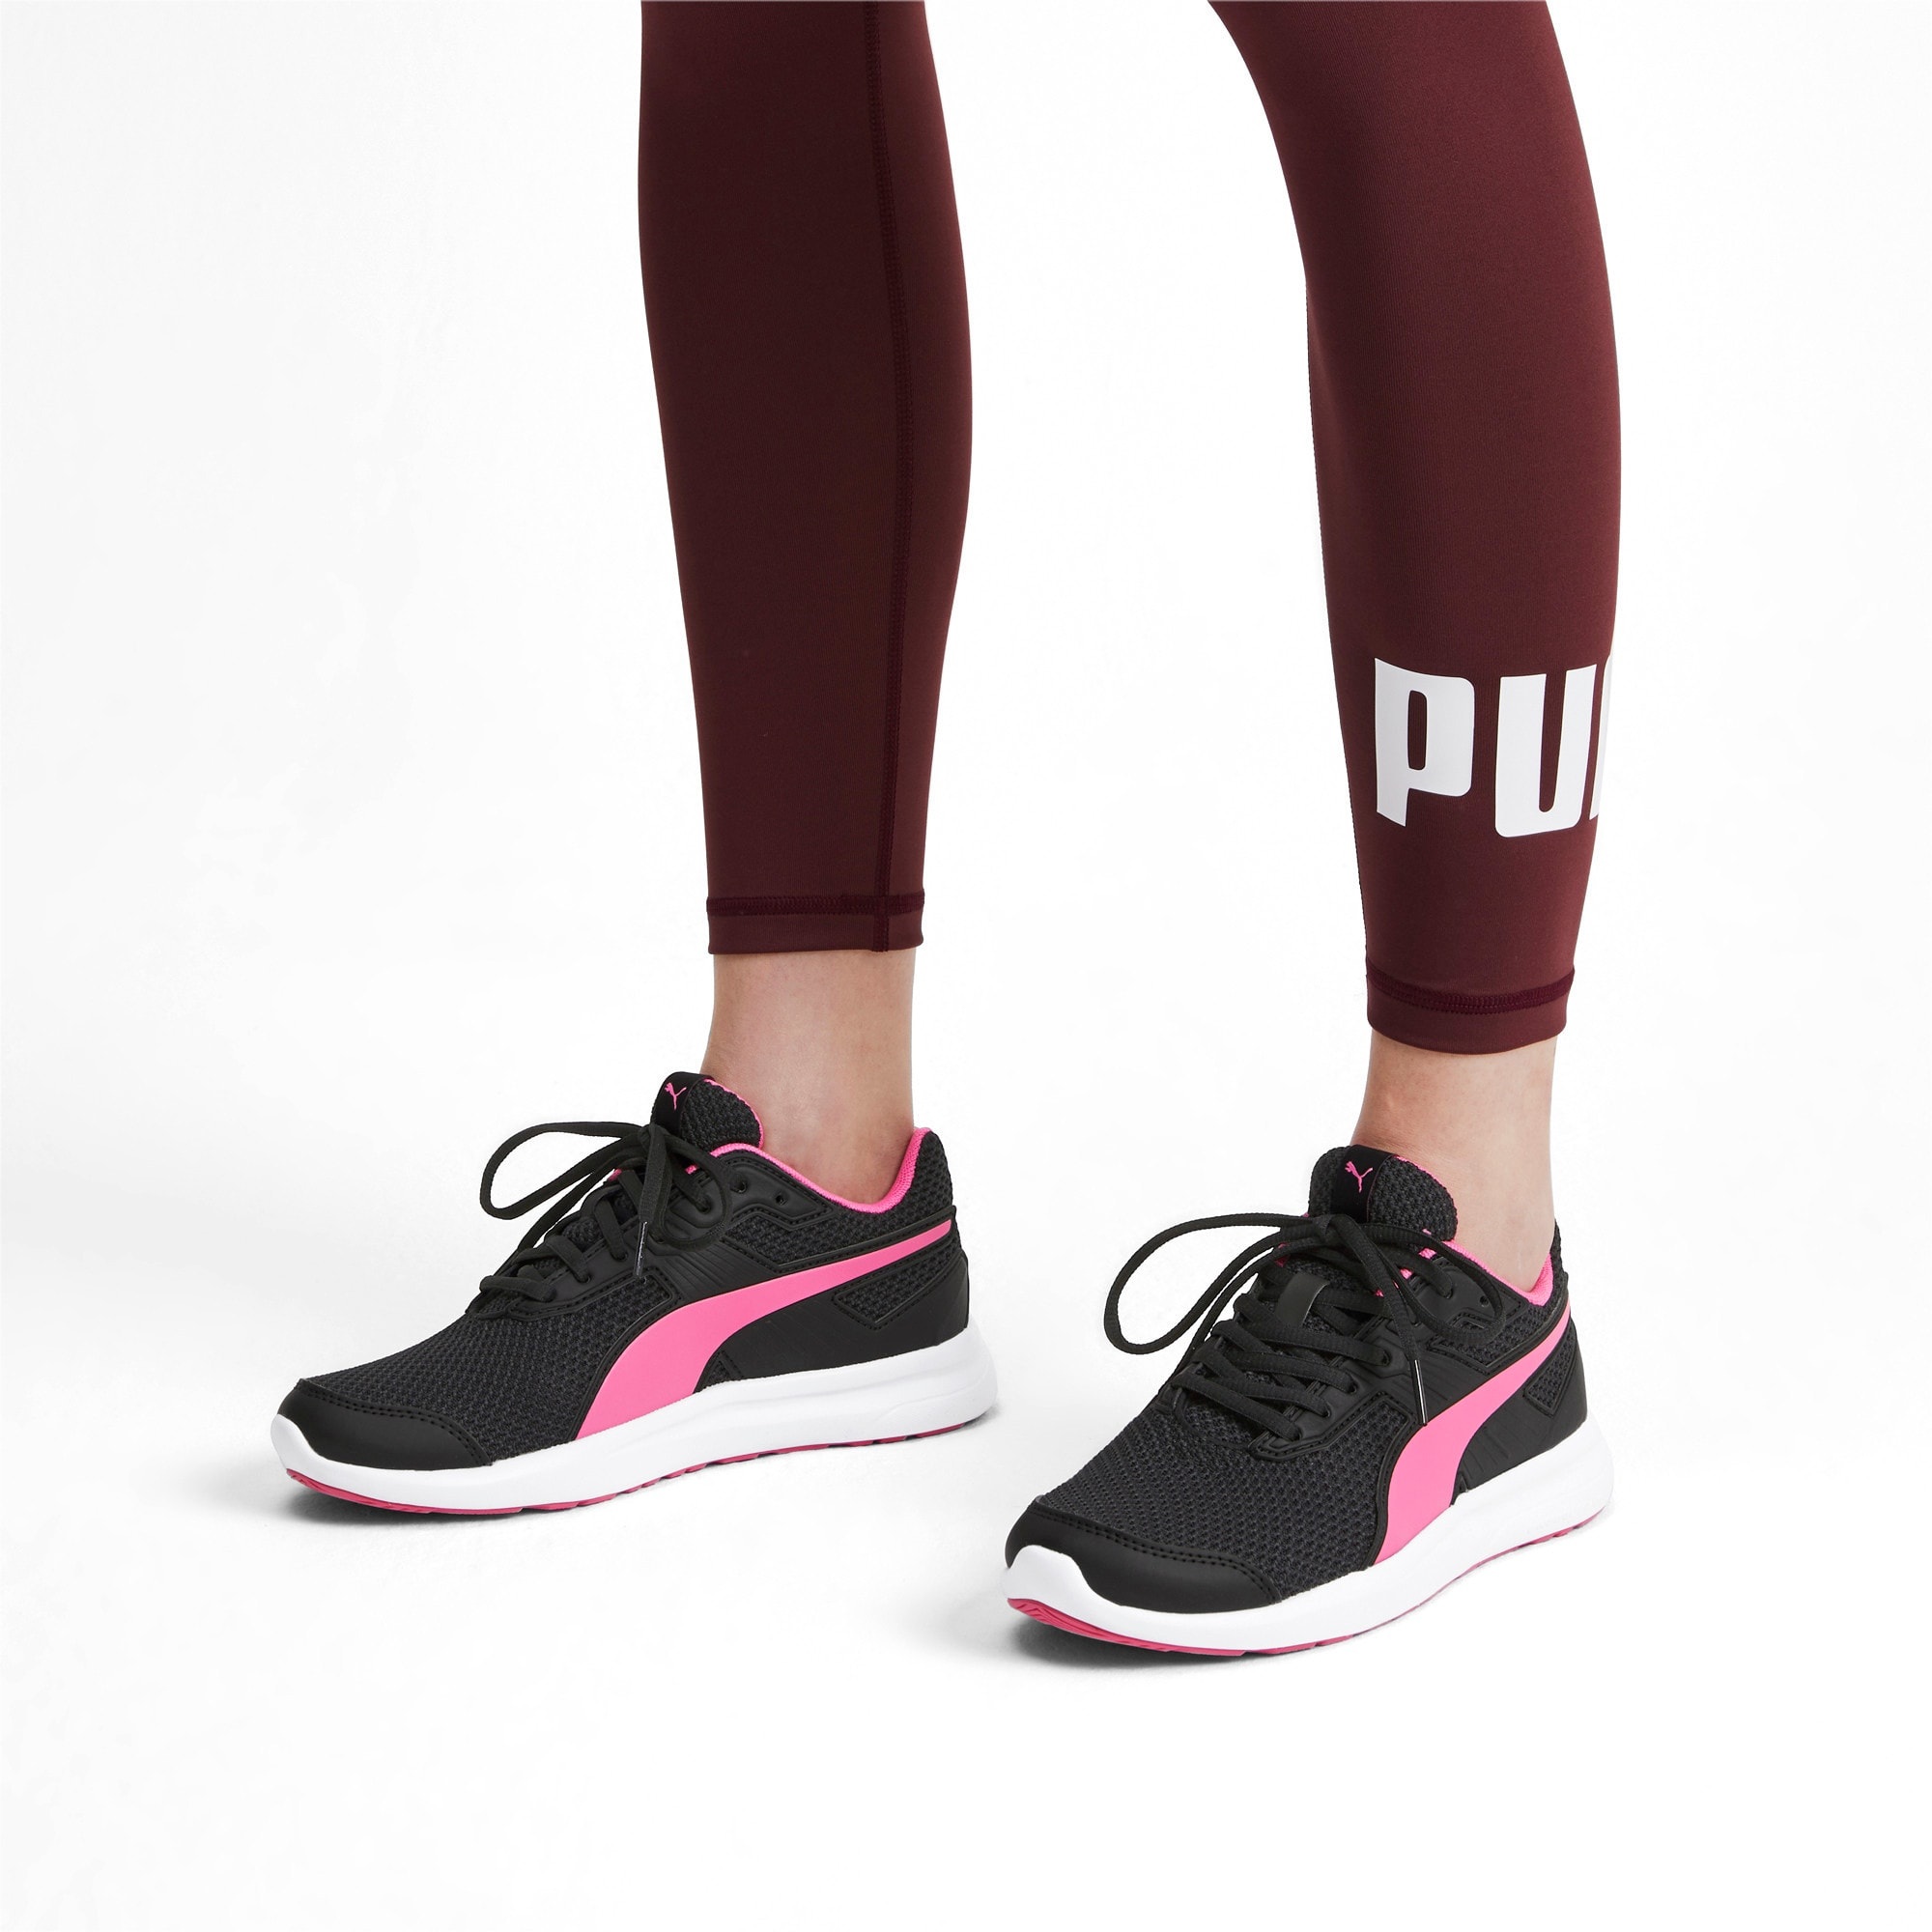 Thumbnail 3 of Escaper Training Shoes, Puma Black-Azalea Pink-White, medium-IND